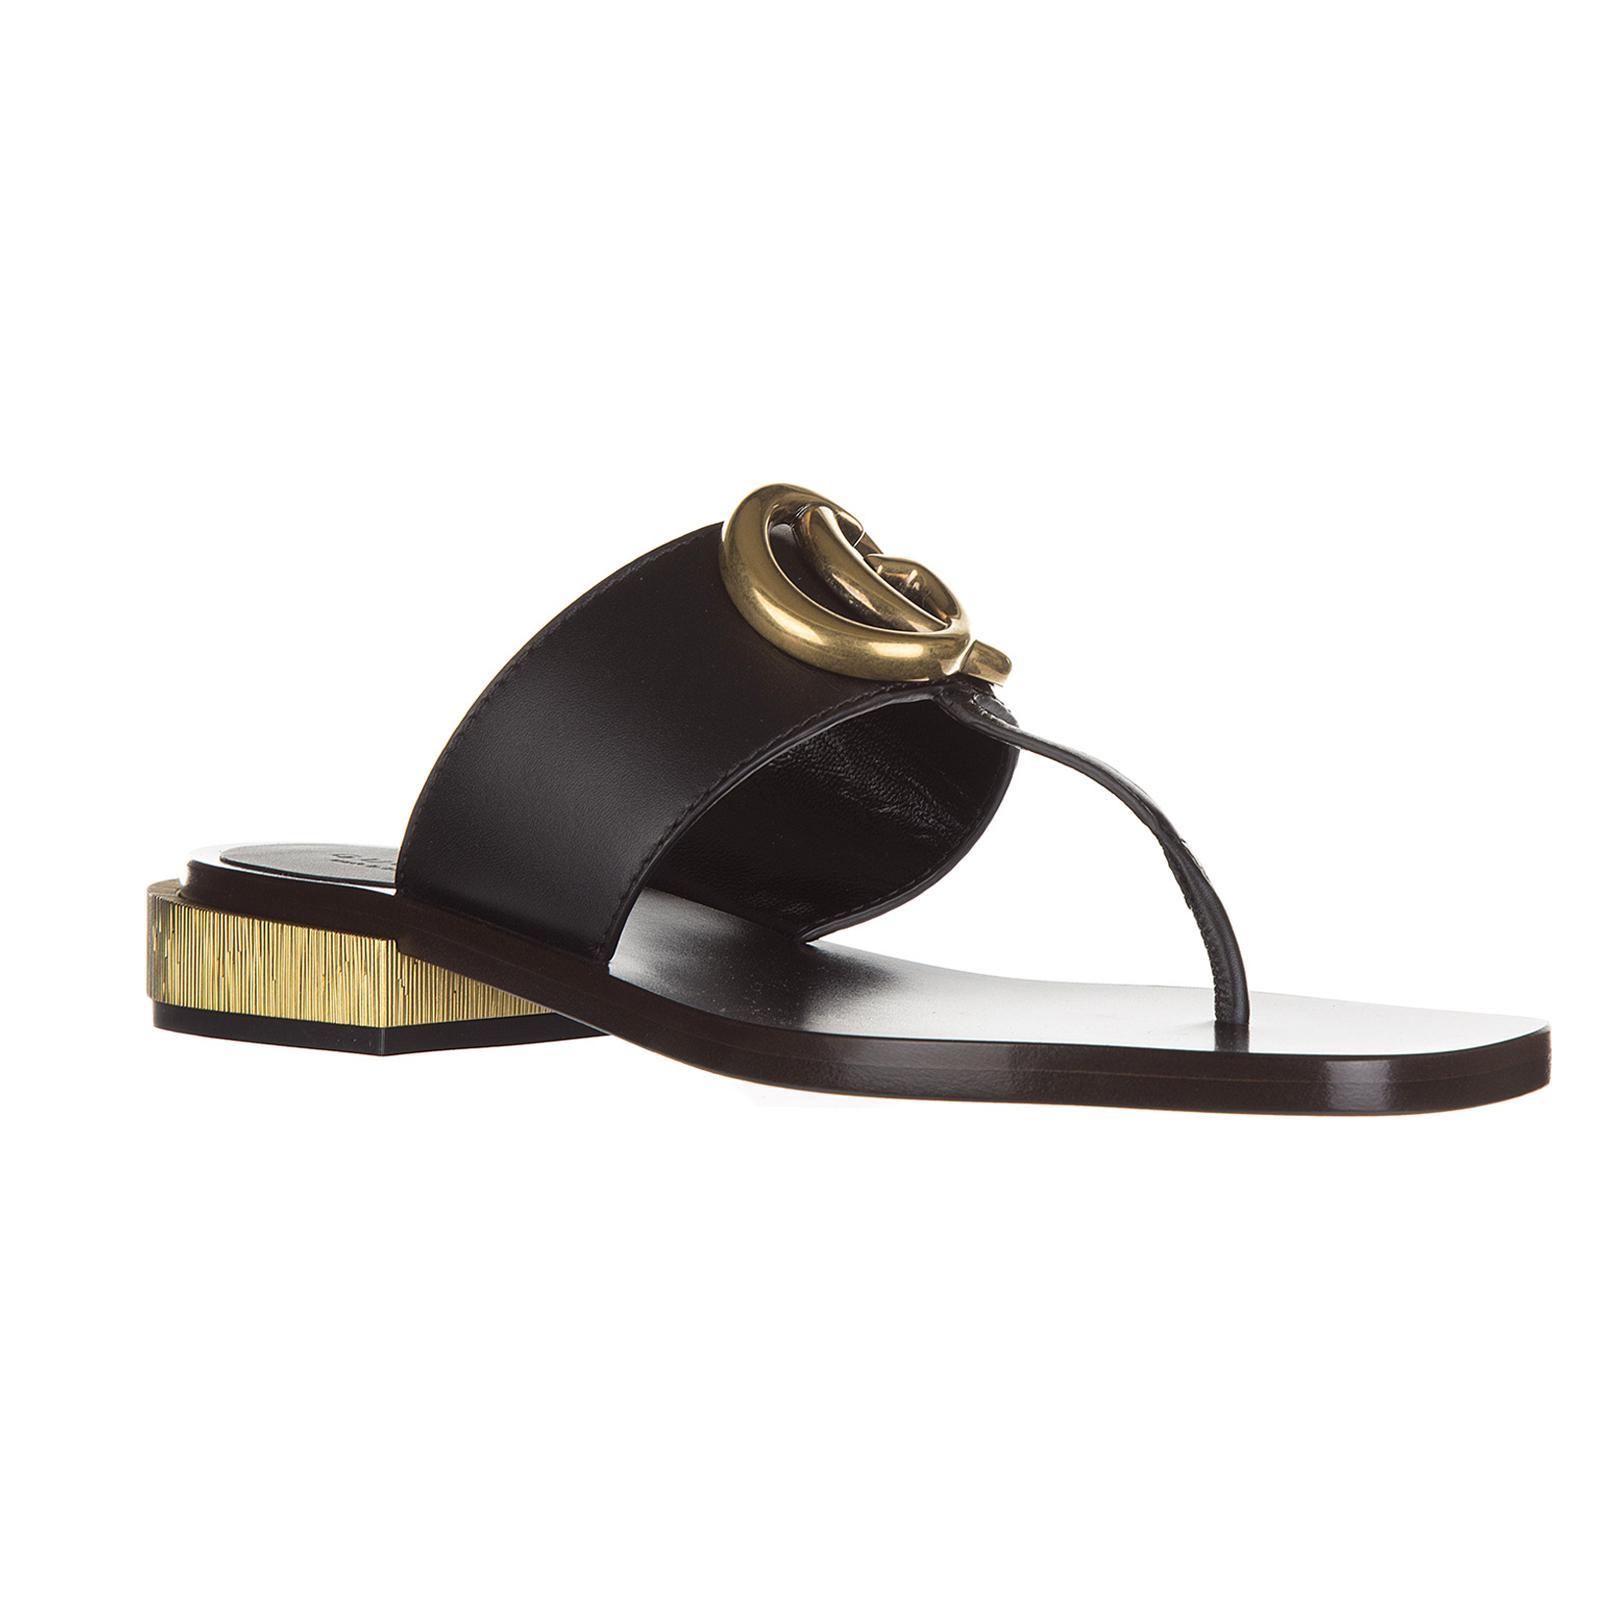 884969903 Gucci Leather Flip Flops Sandals Lifford in Black - Lyst